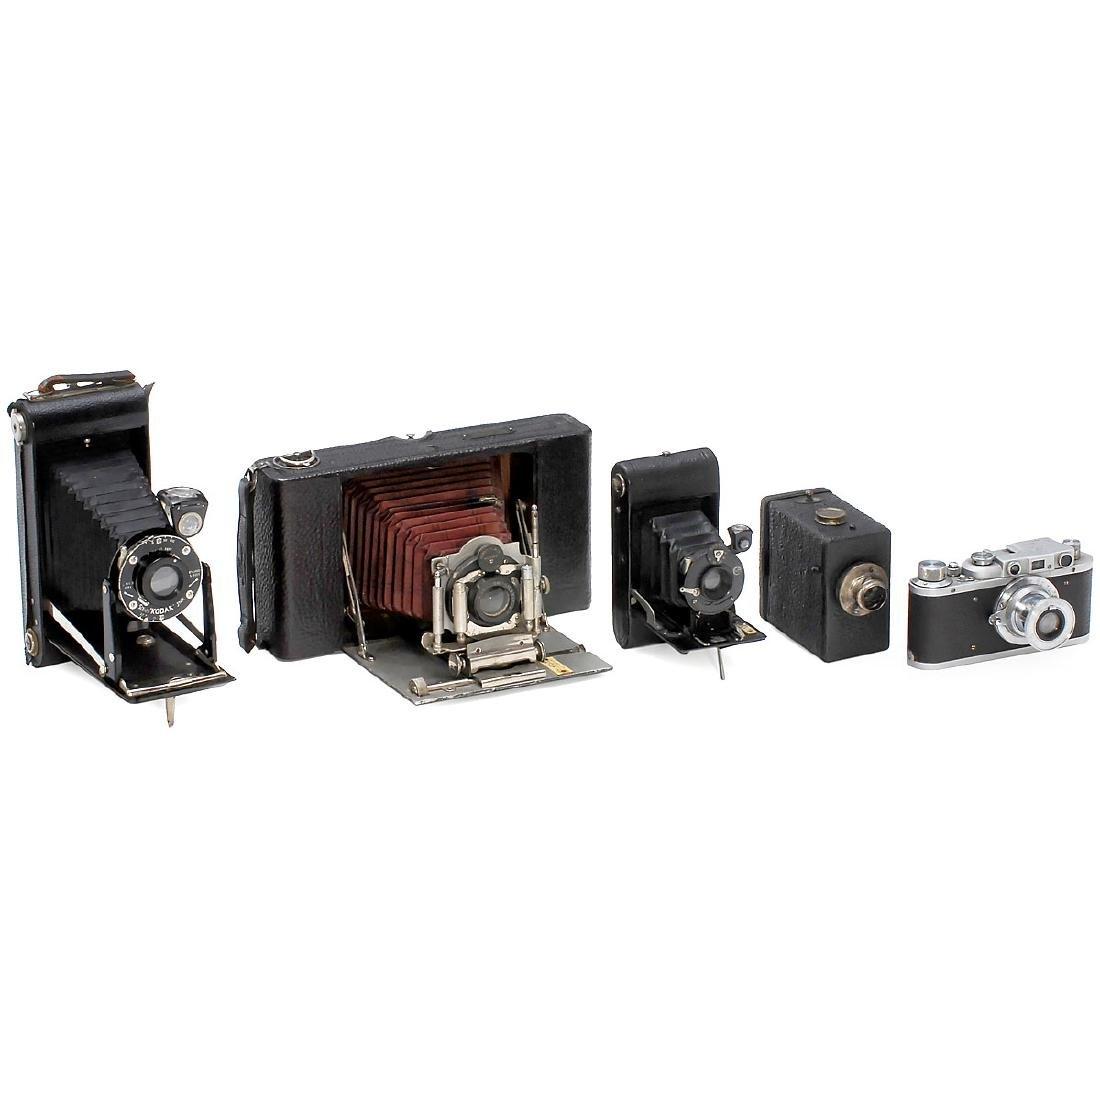 4 Rollfilm and Box Cameras